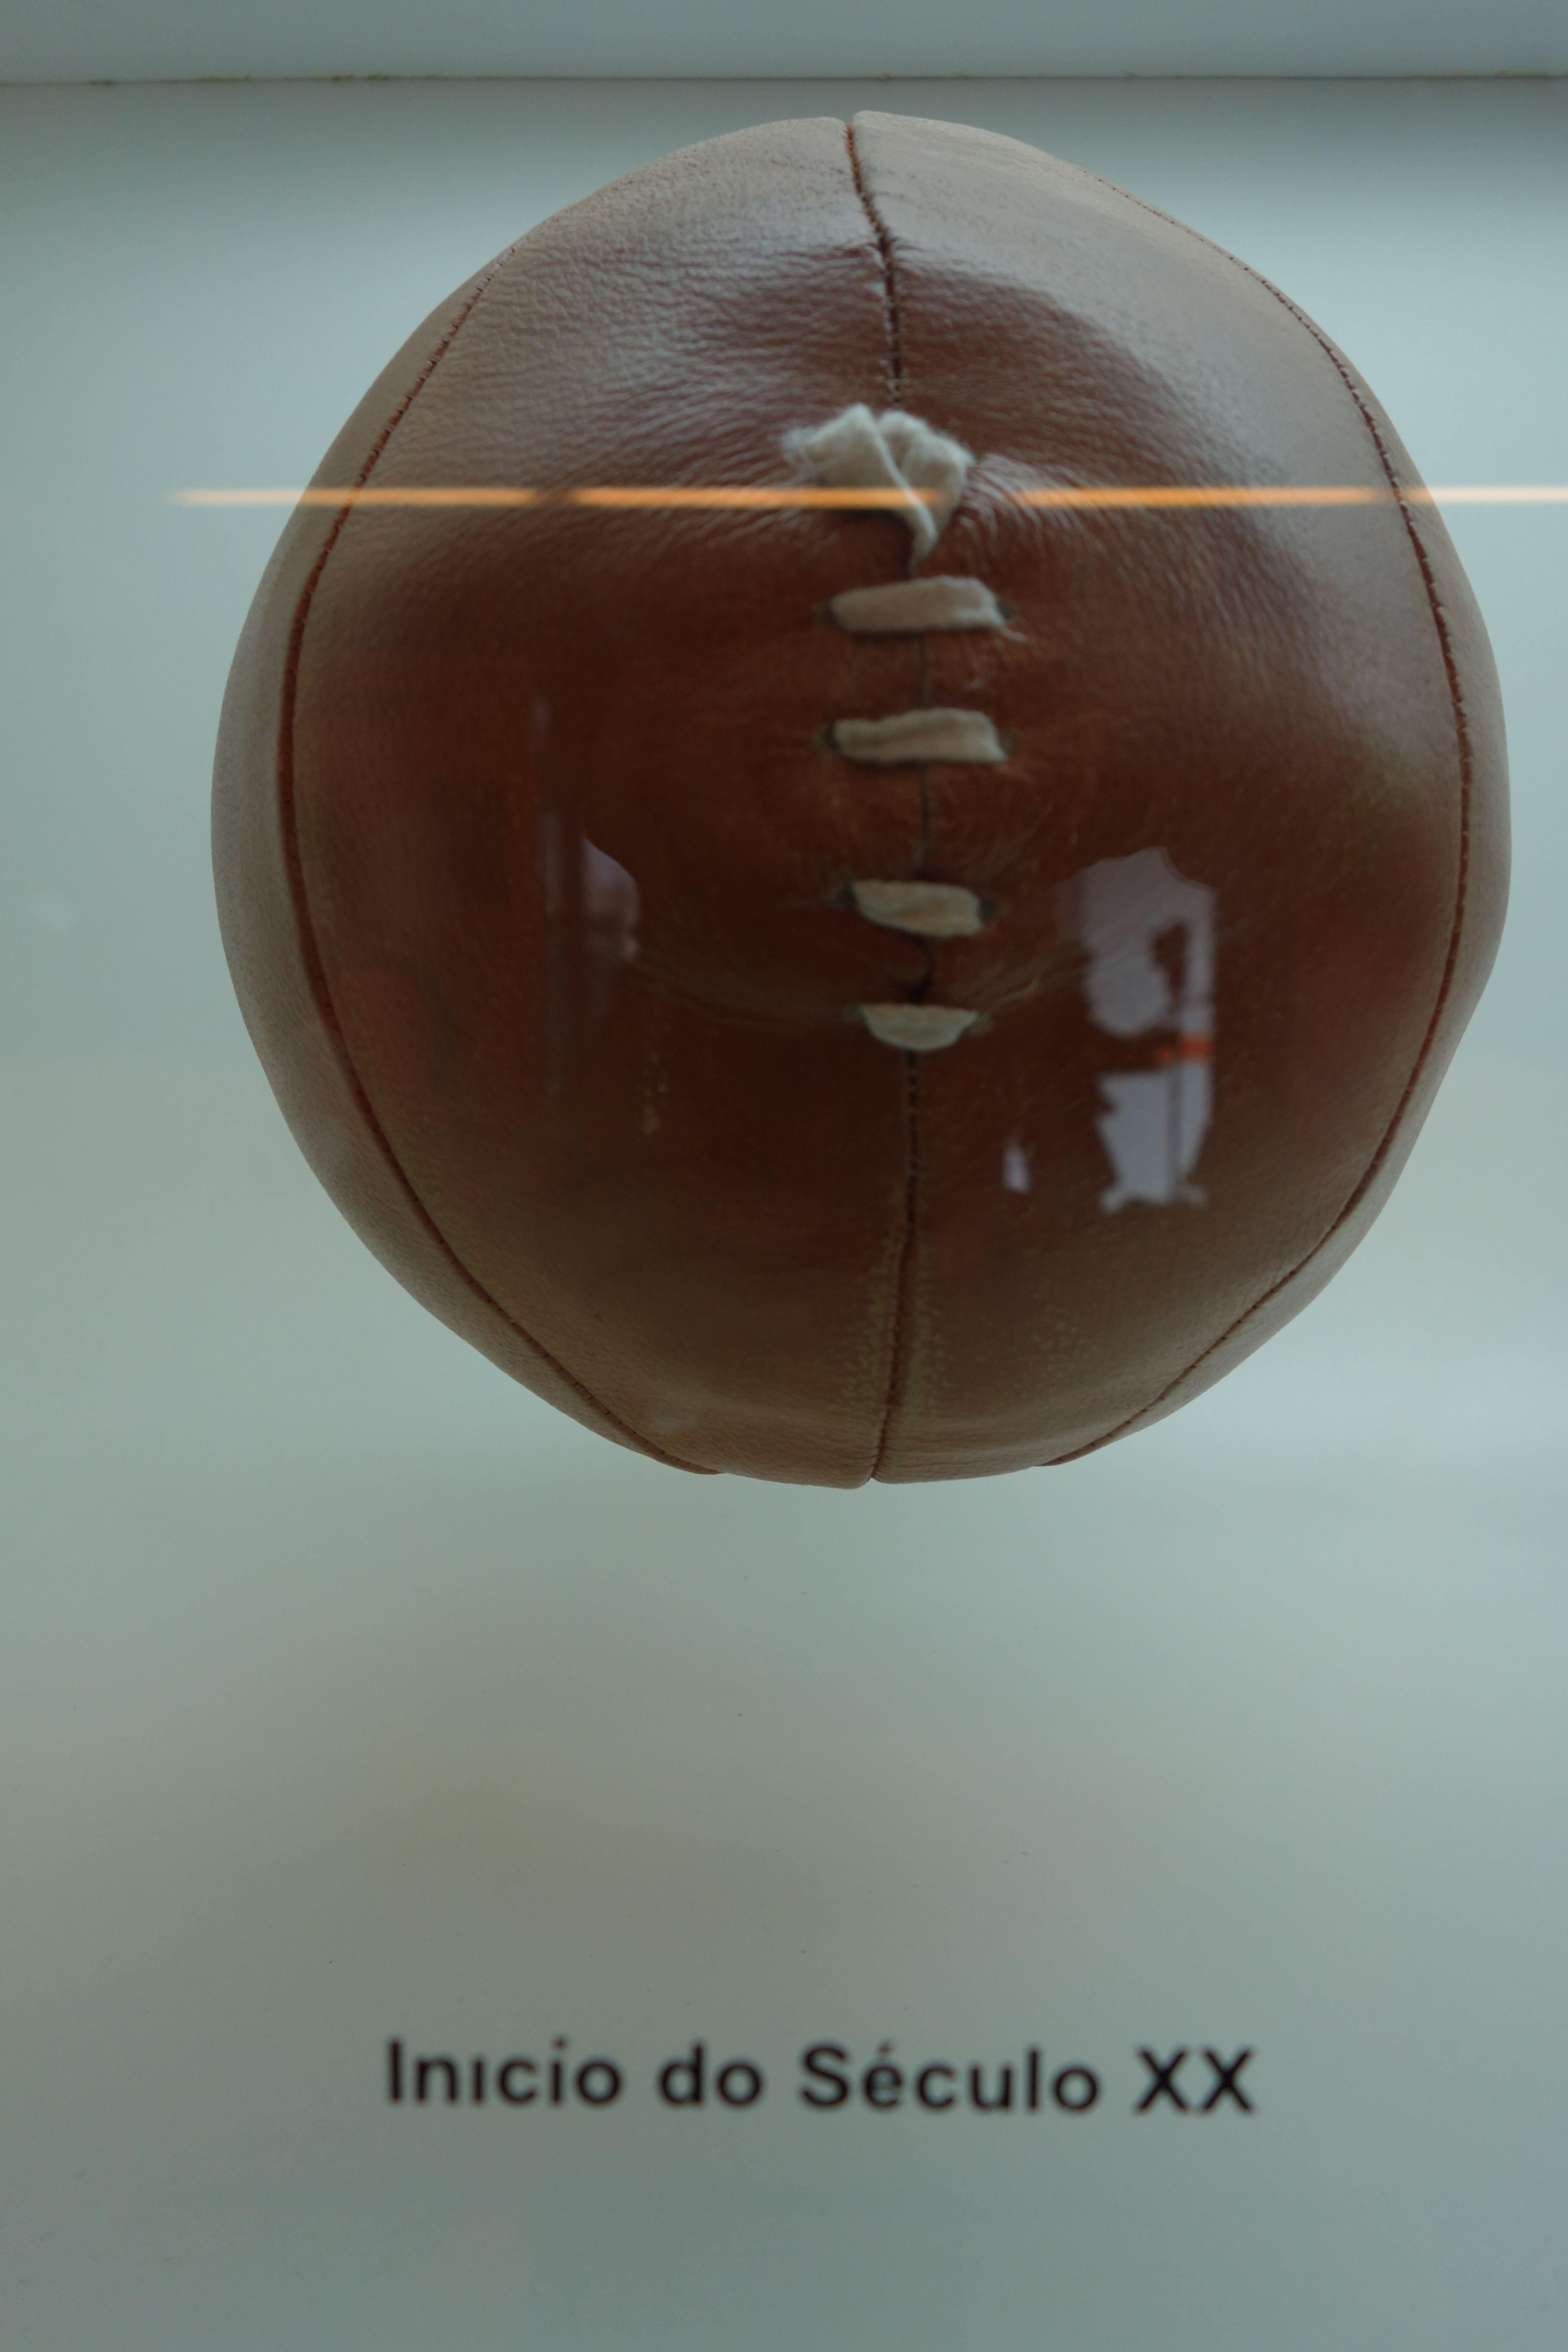 COUPE DU MONDE DE FOOTBALL: Musee du football a Sao Paulo, les premiers ballons de football.